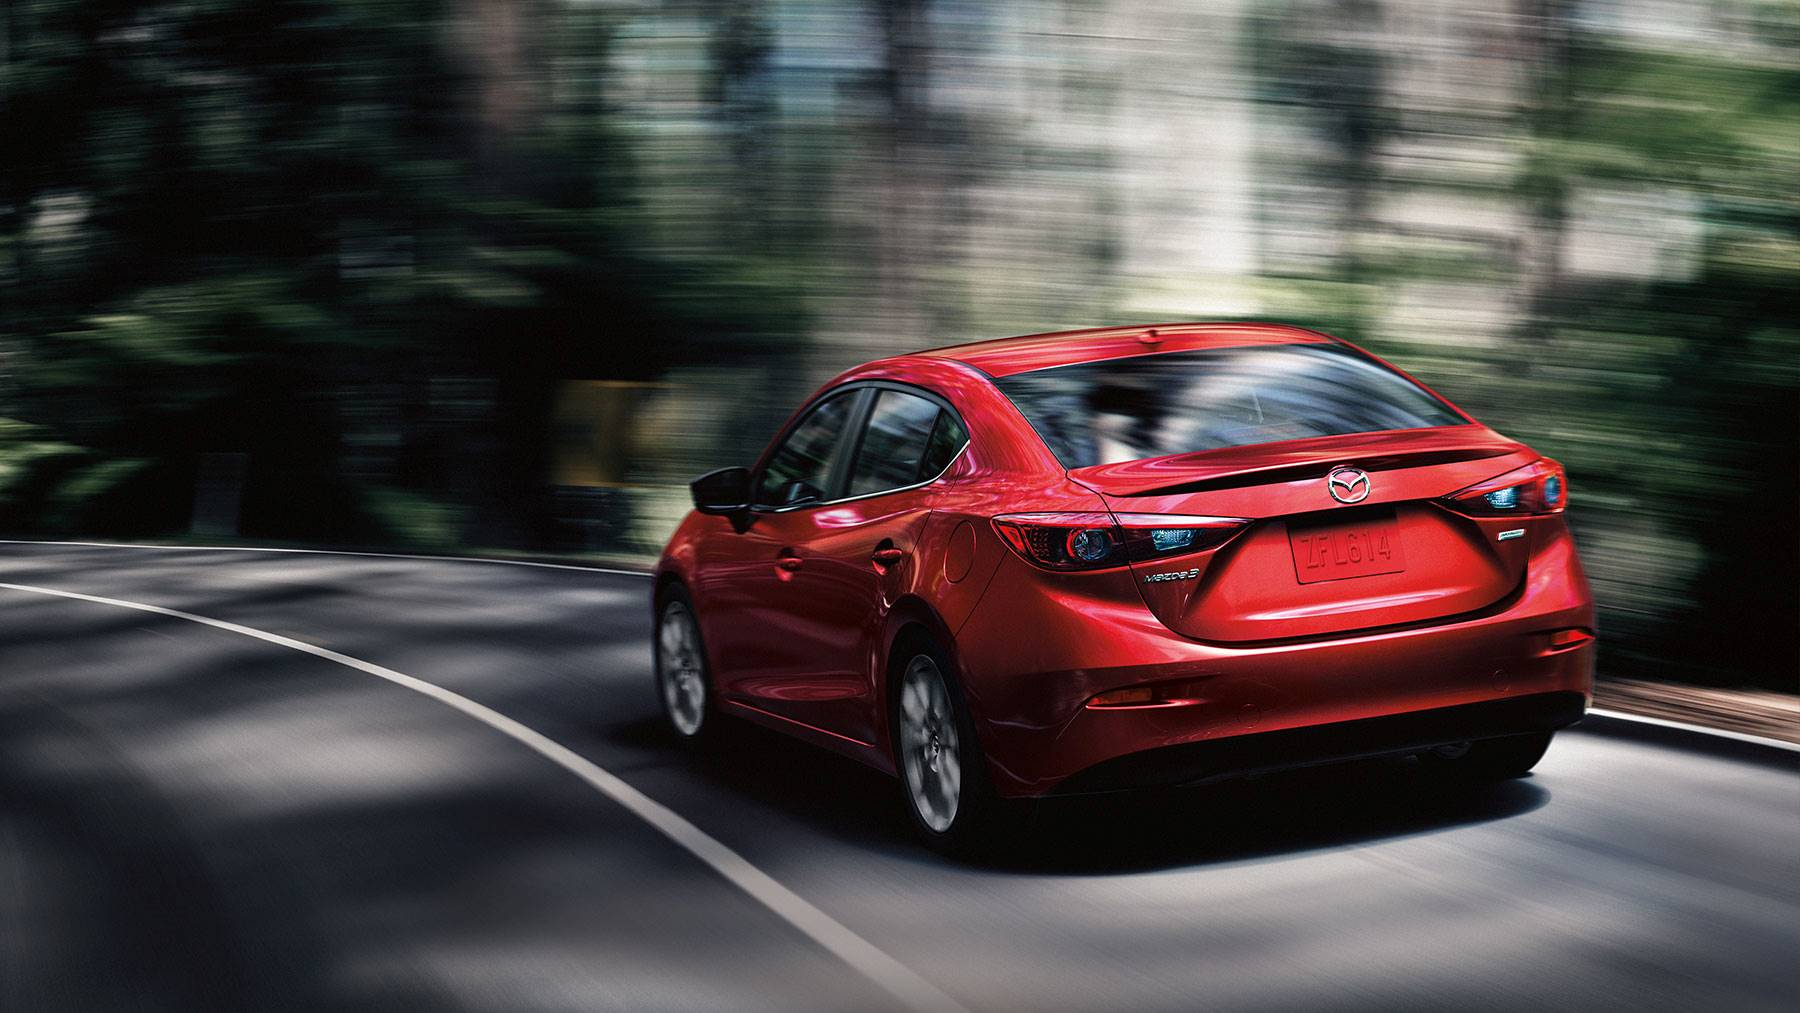 2018 Mazda3 Leasing near Universal City, TX